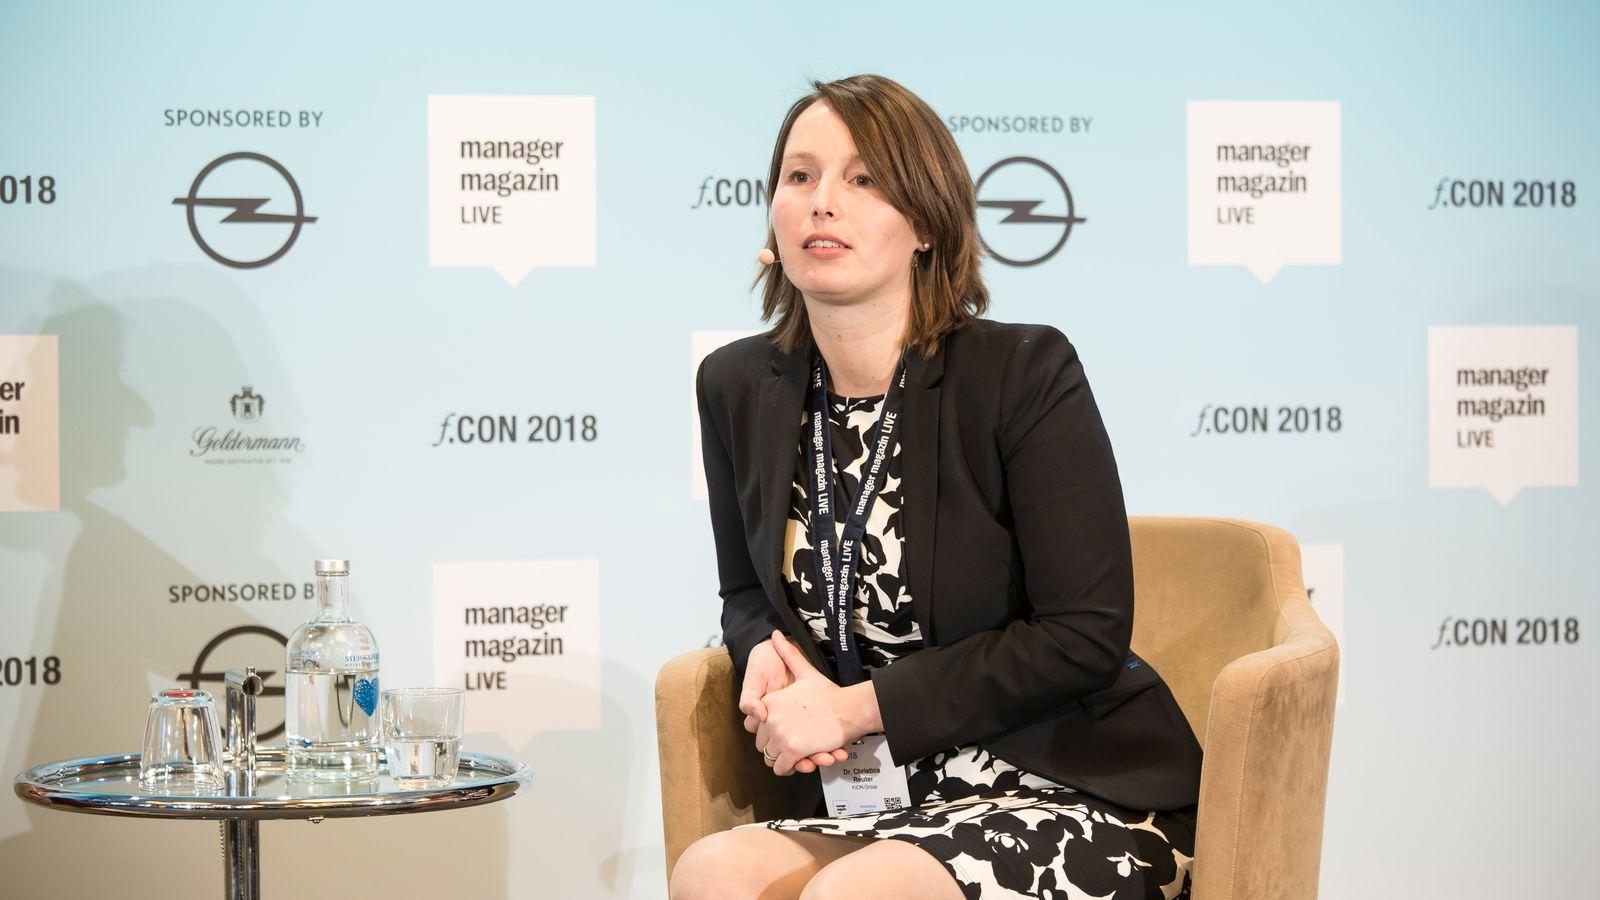 Christina Reuter / fcon 2018